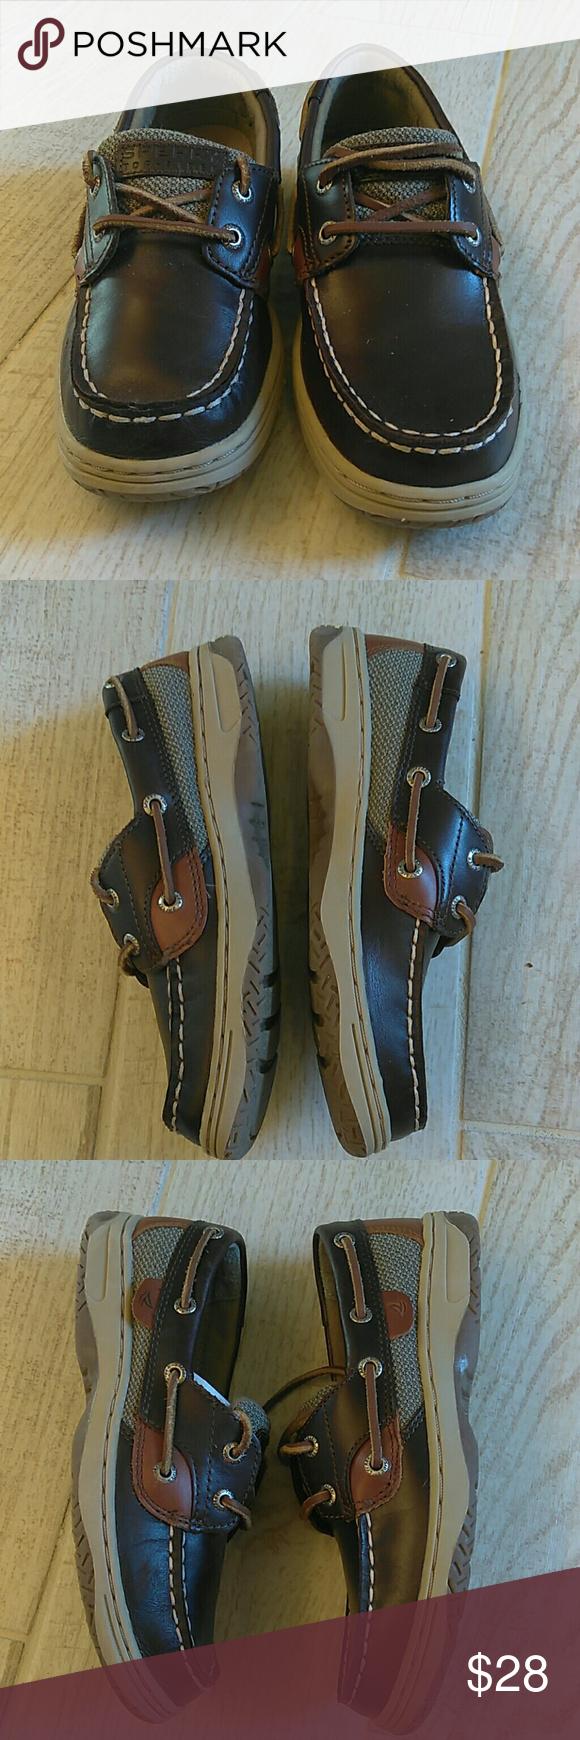 Sperry Top-siders Sperry Top-siders Sperry Shoes